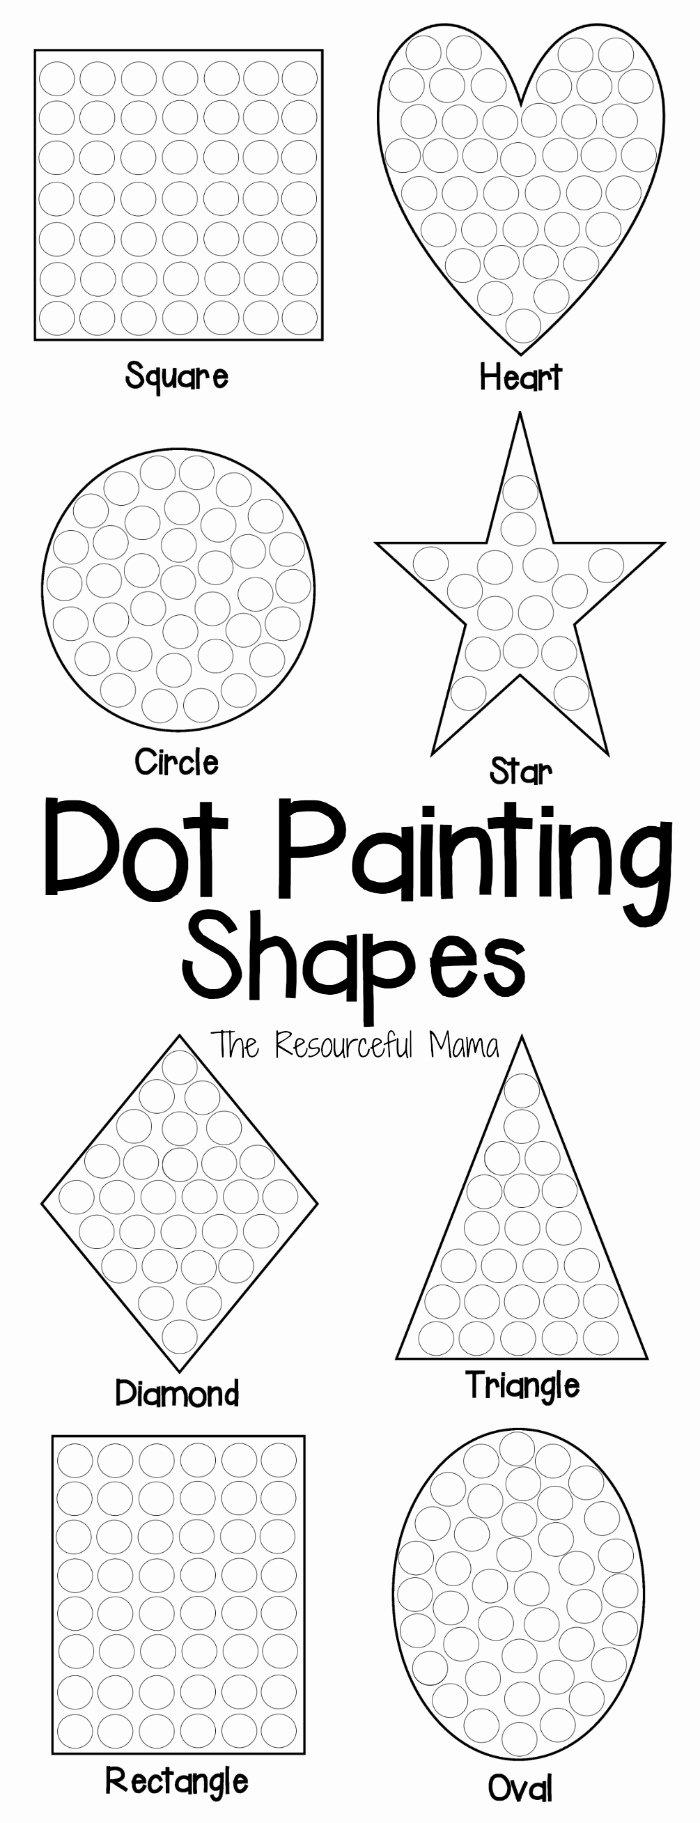 Dot to Dot Art Printables Fresh Shapes Dot Painting Free Printable the Resourceful Mama